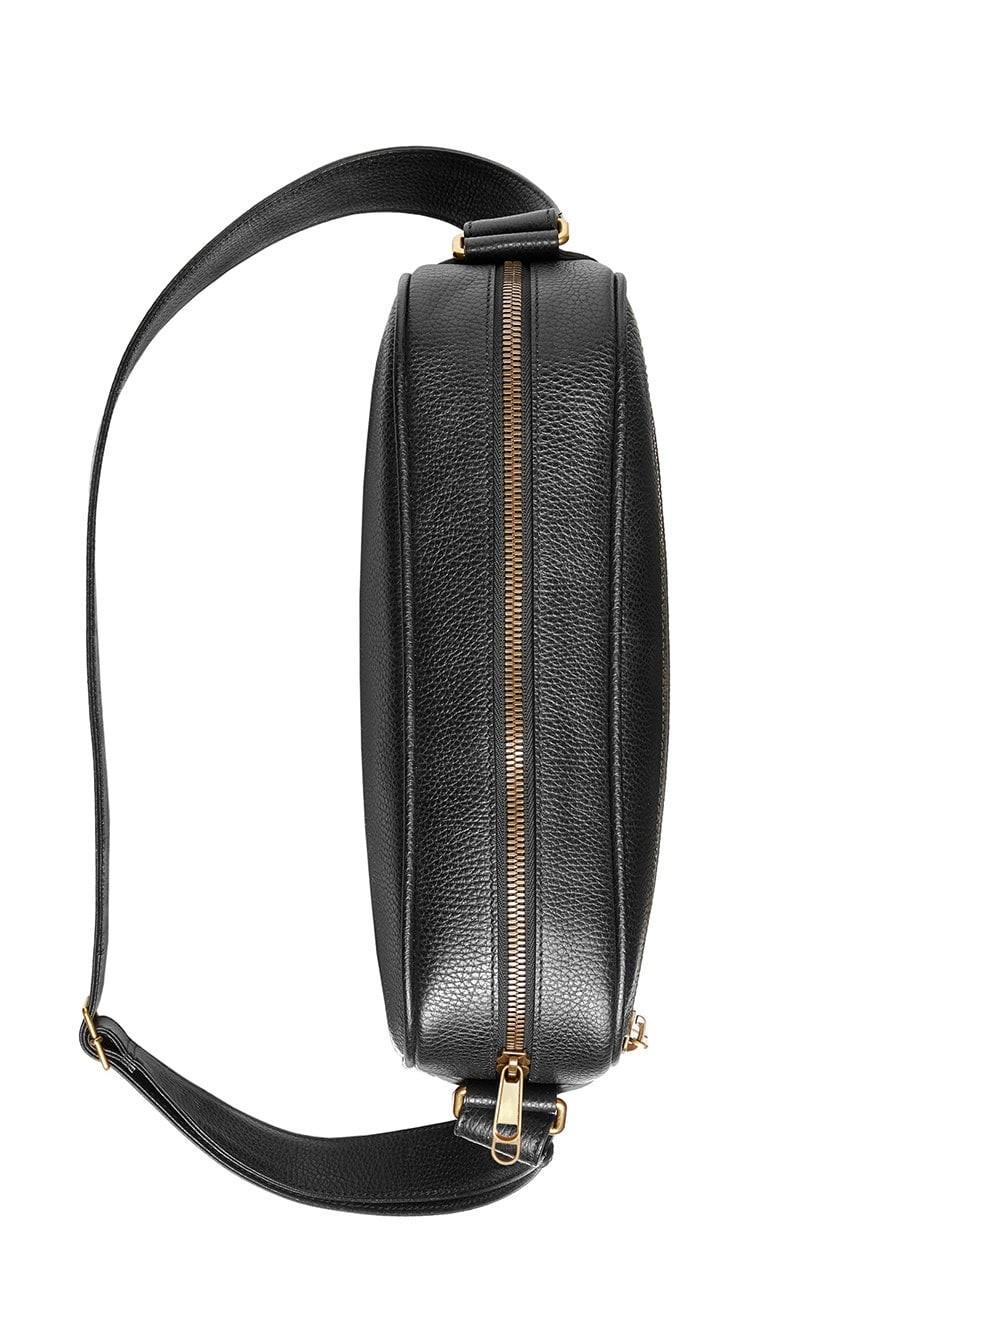 4a29141a3f44 gucci LOGO SHOULDER BAG available on montiboutique.com - 25059